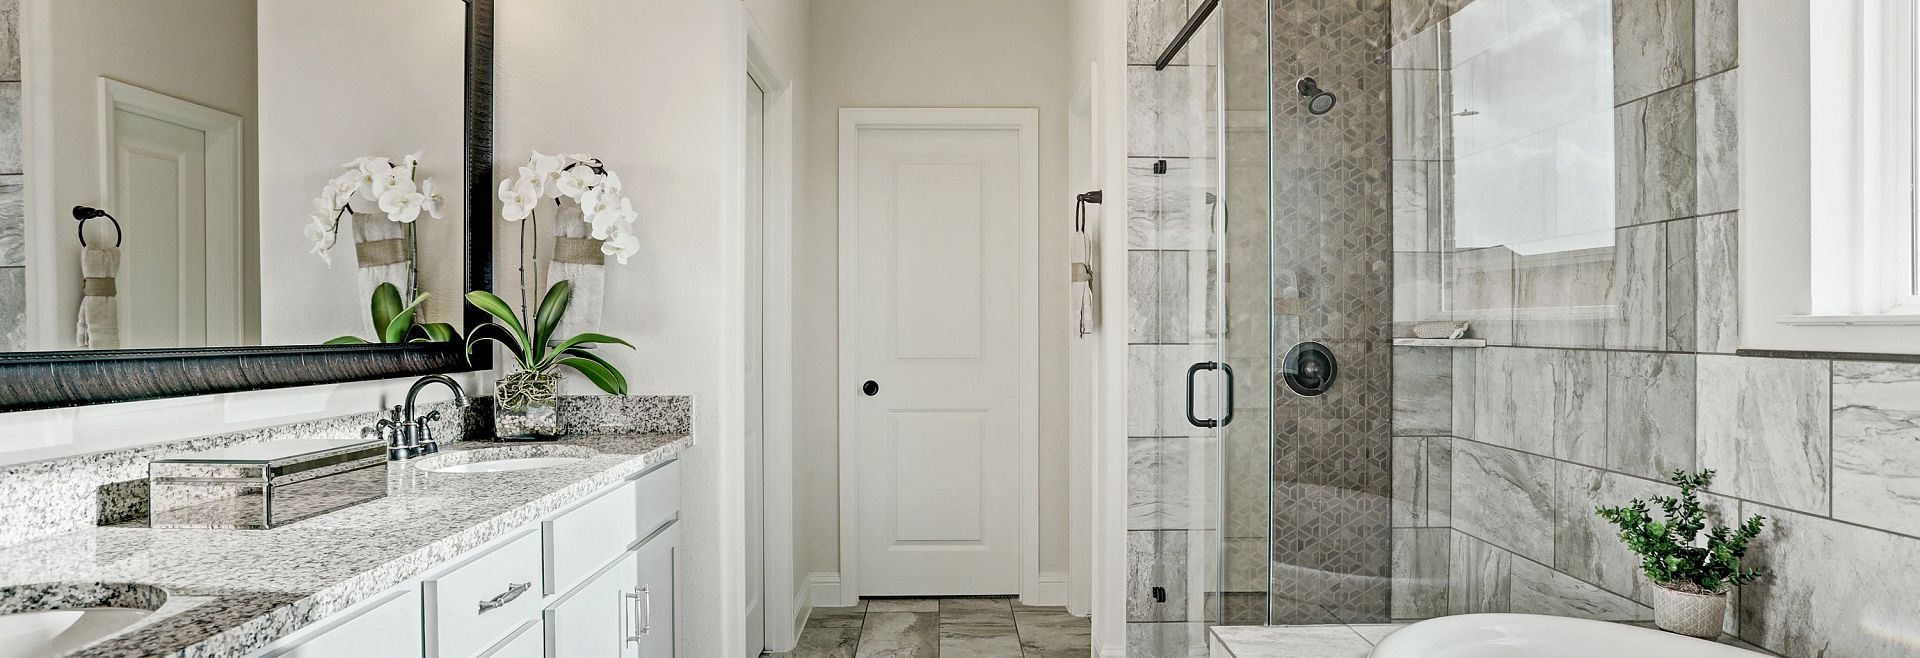 Balmoral Plan 4069 Bathroom